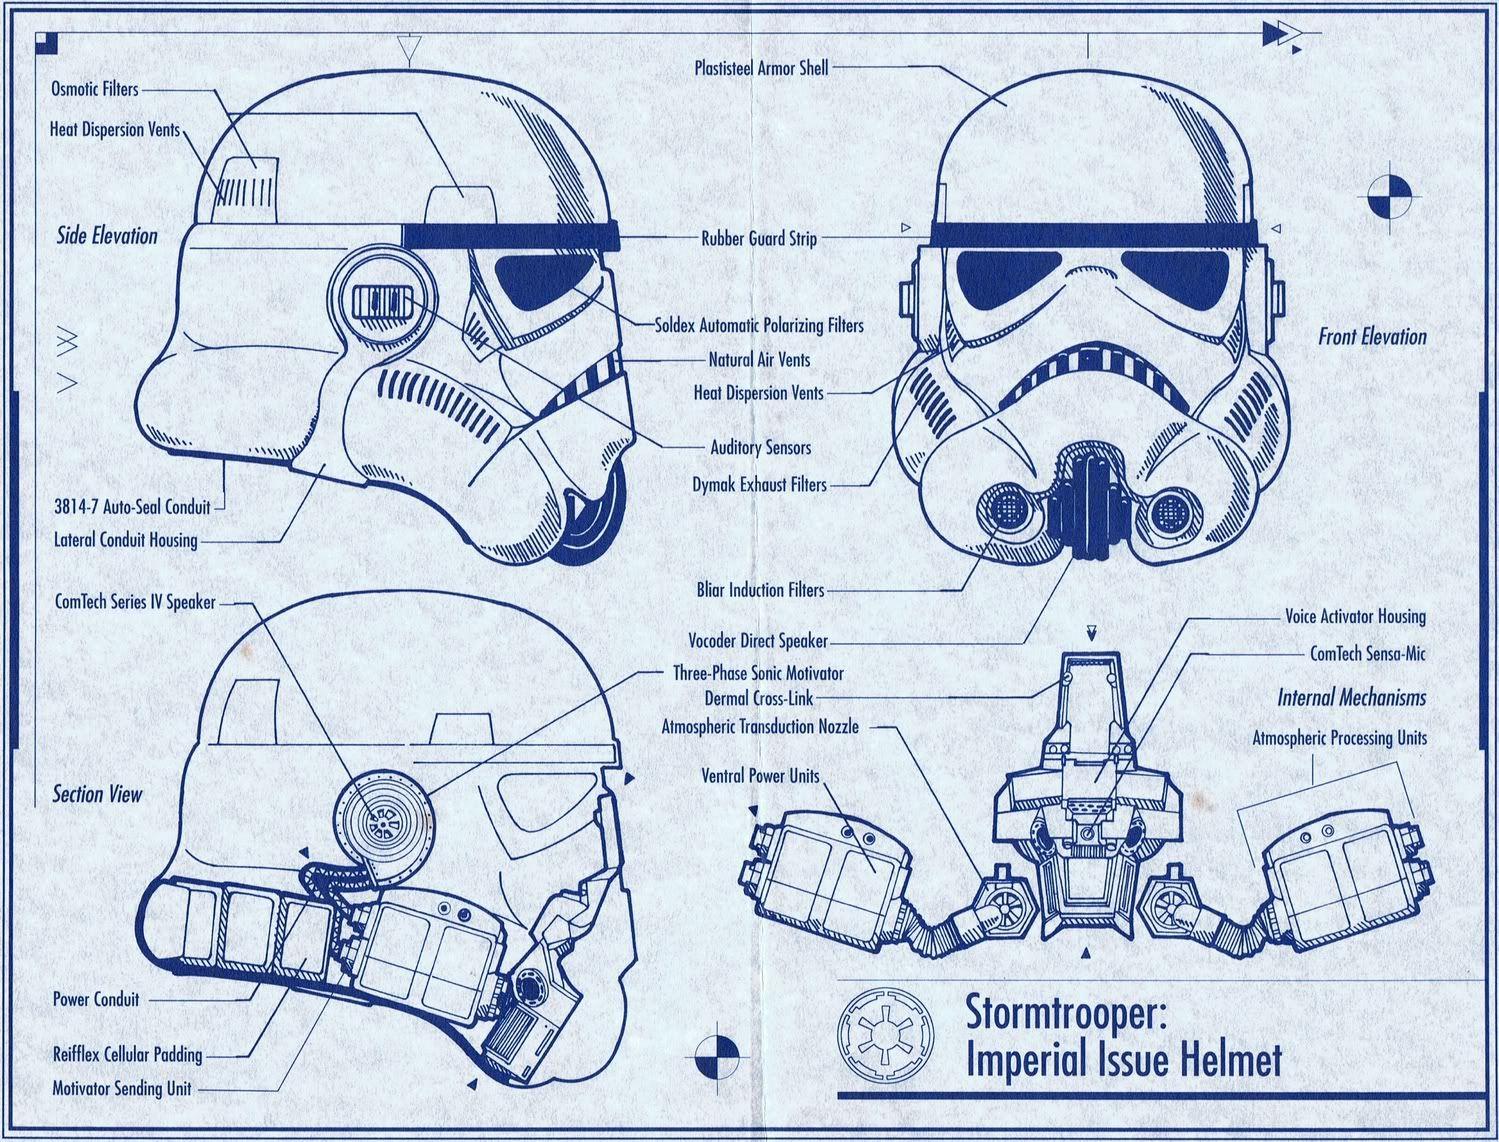 Stormtrooper armor | Pinterest | Star, Starwars and Star wars stuff